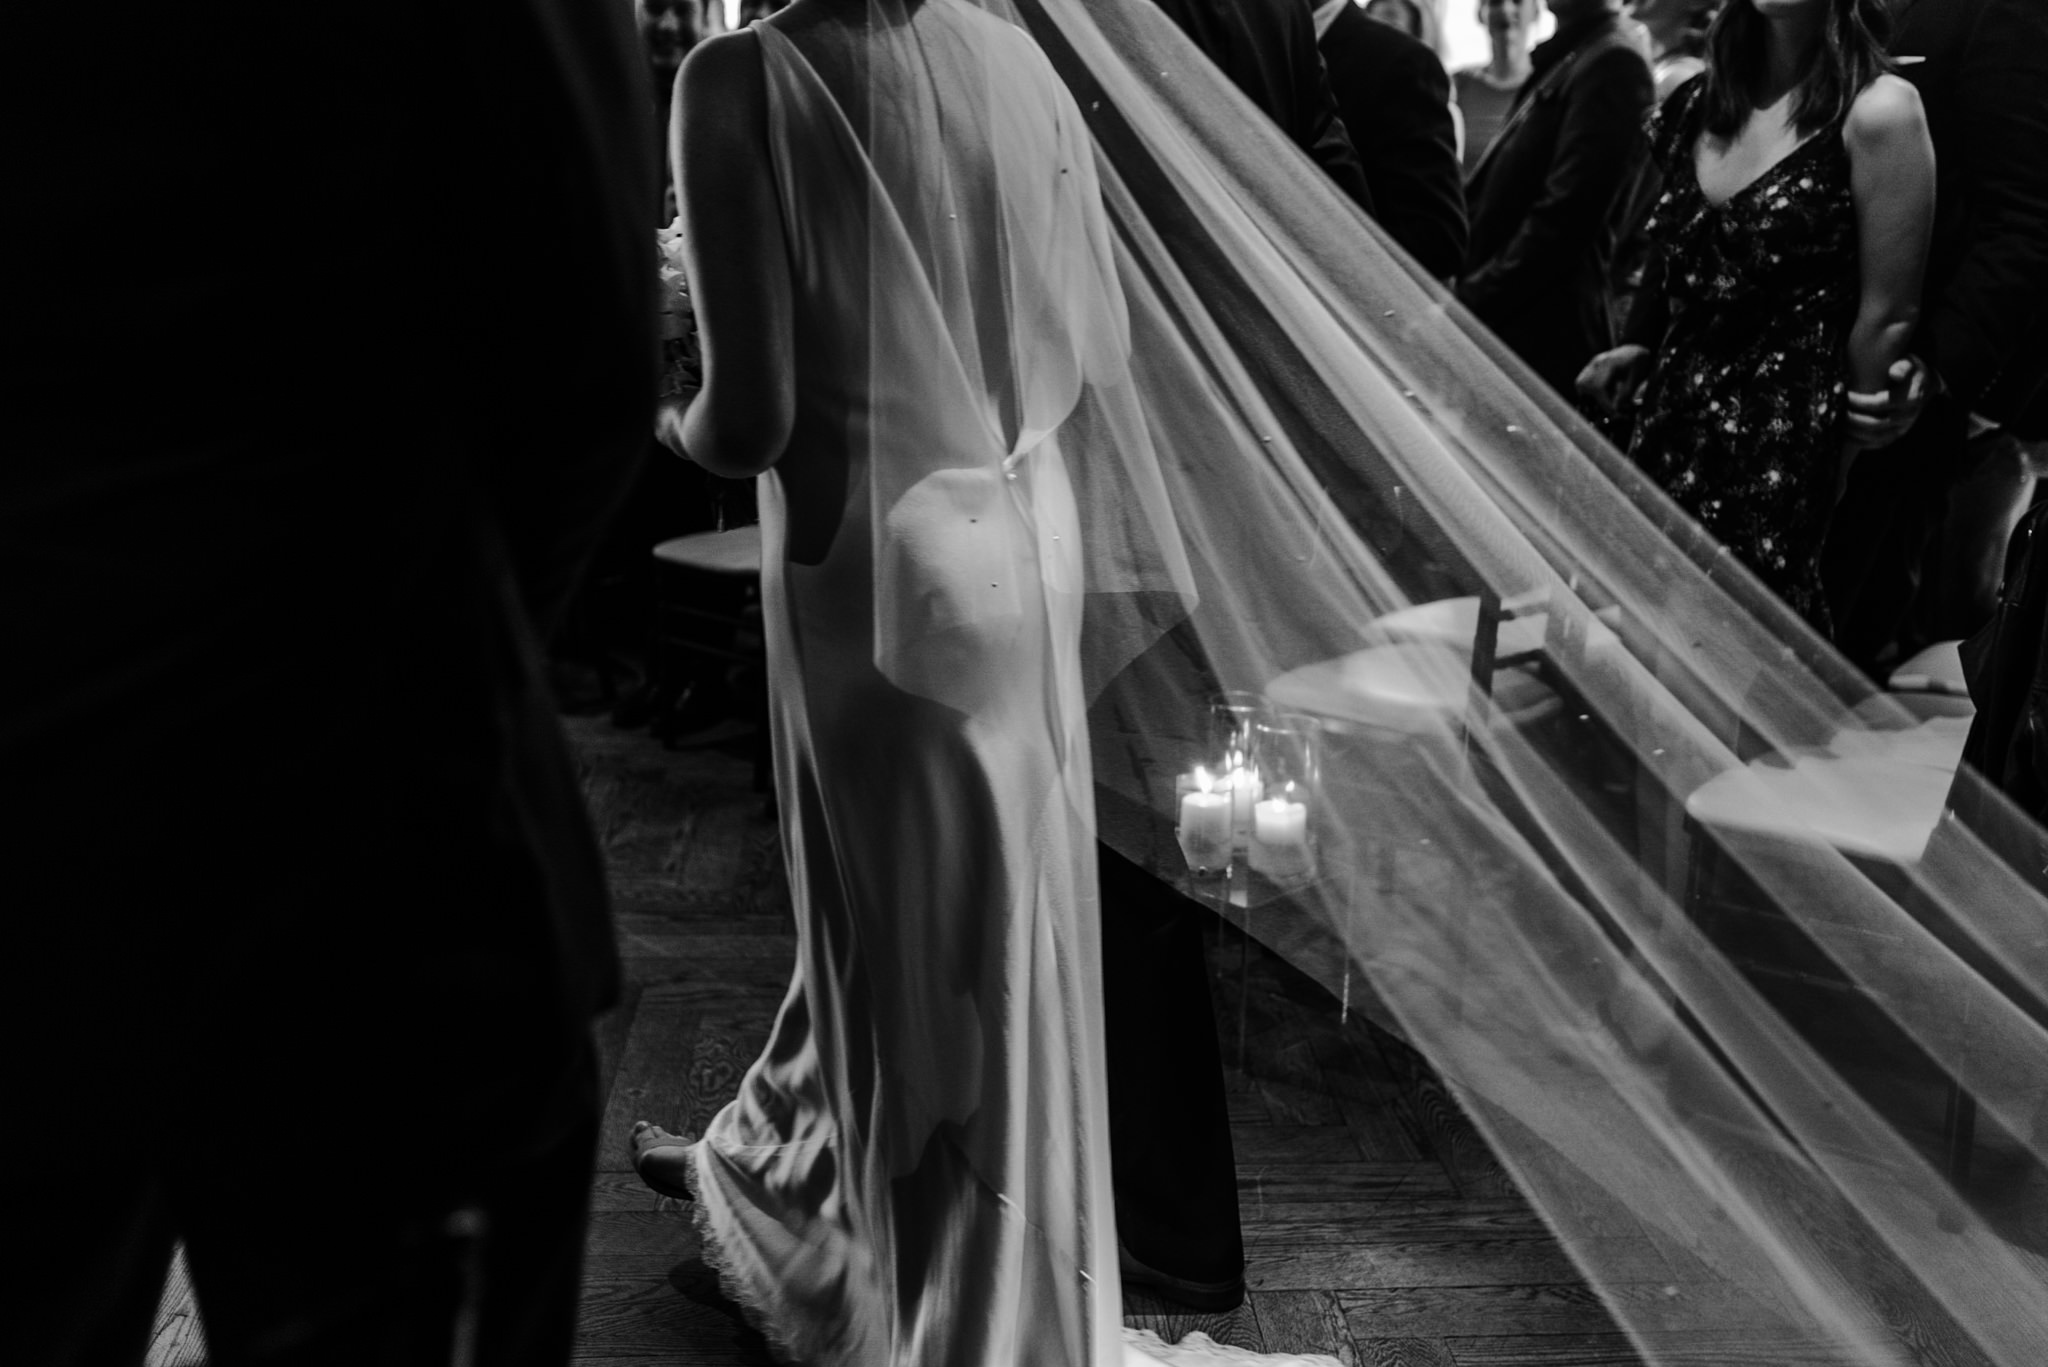 110-bride-father-wedding-ceremony-processional.jpg